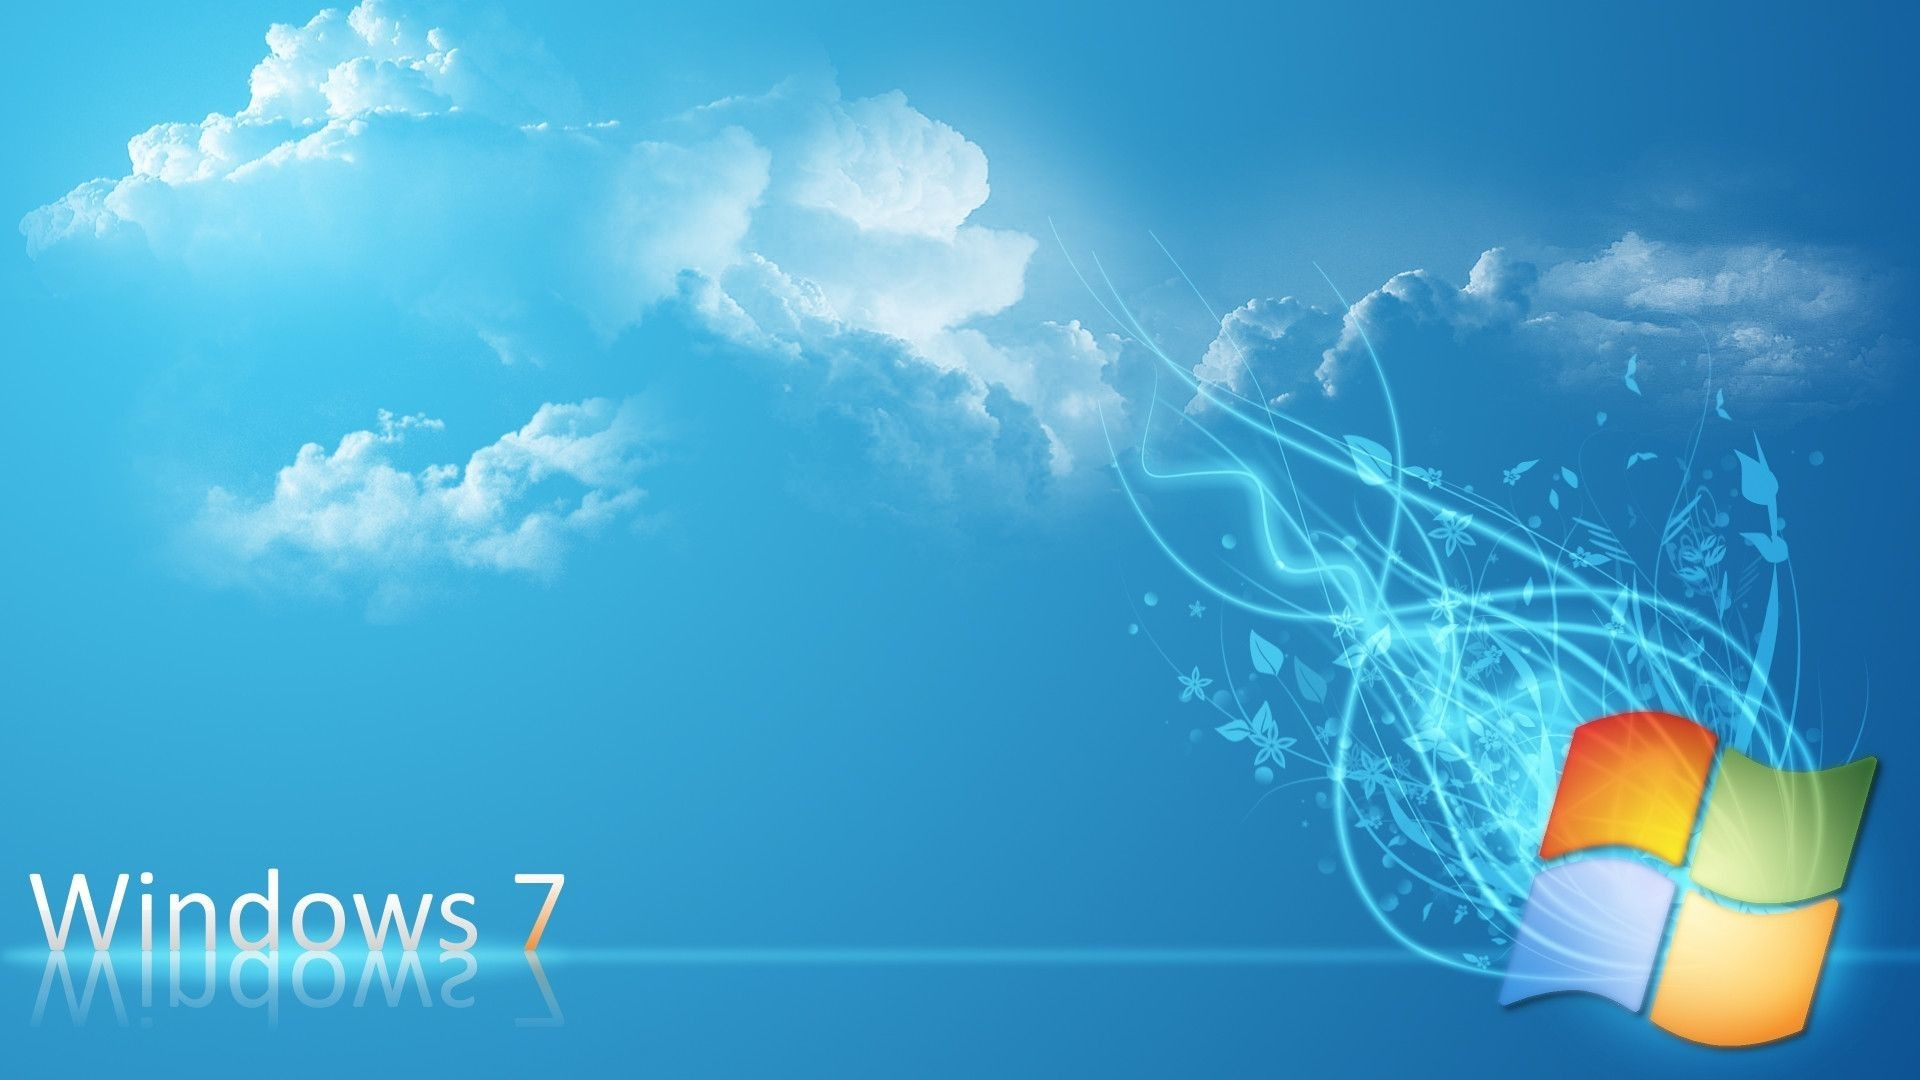 Windows 7 Home Premium Wallpaper 64 Pictures